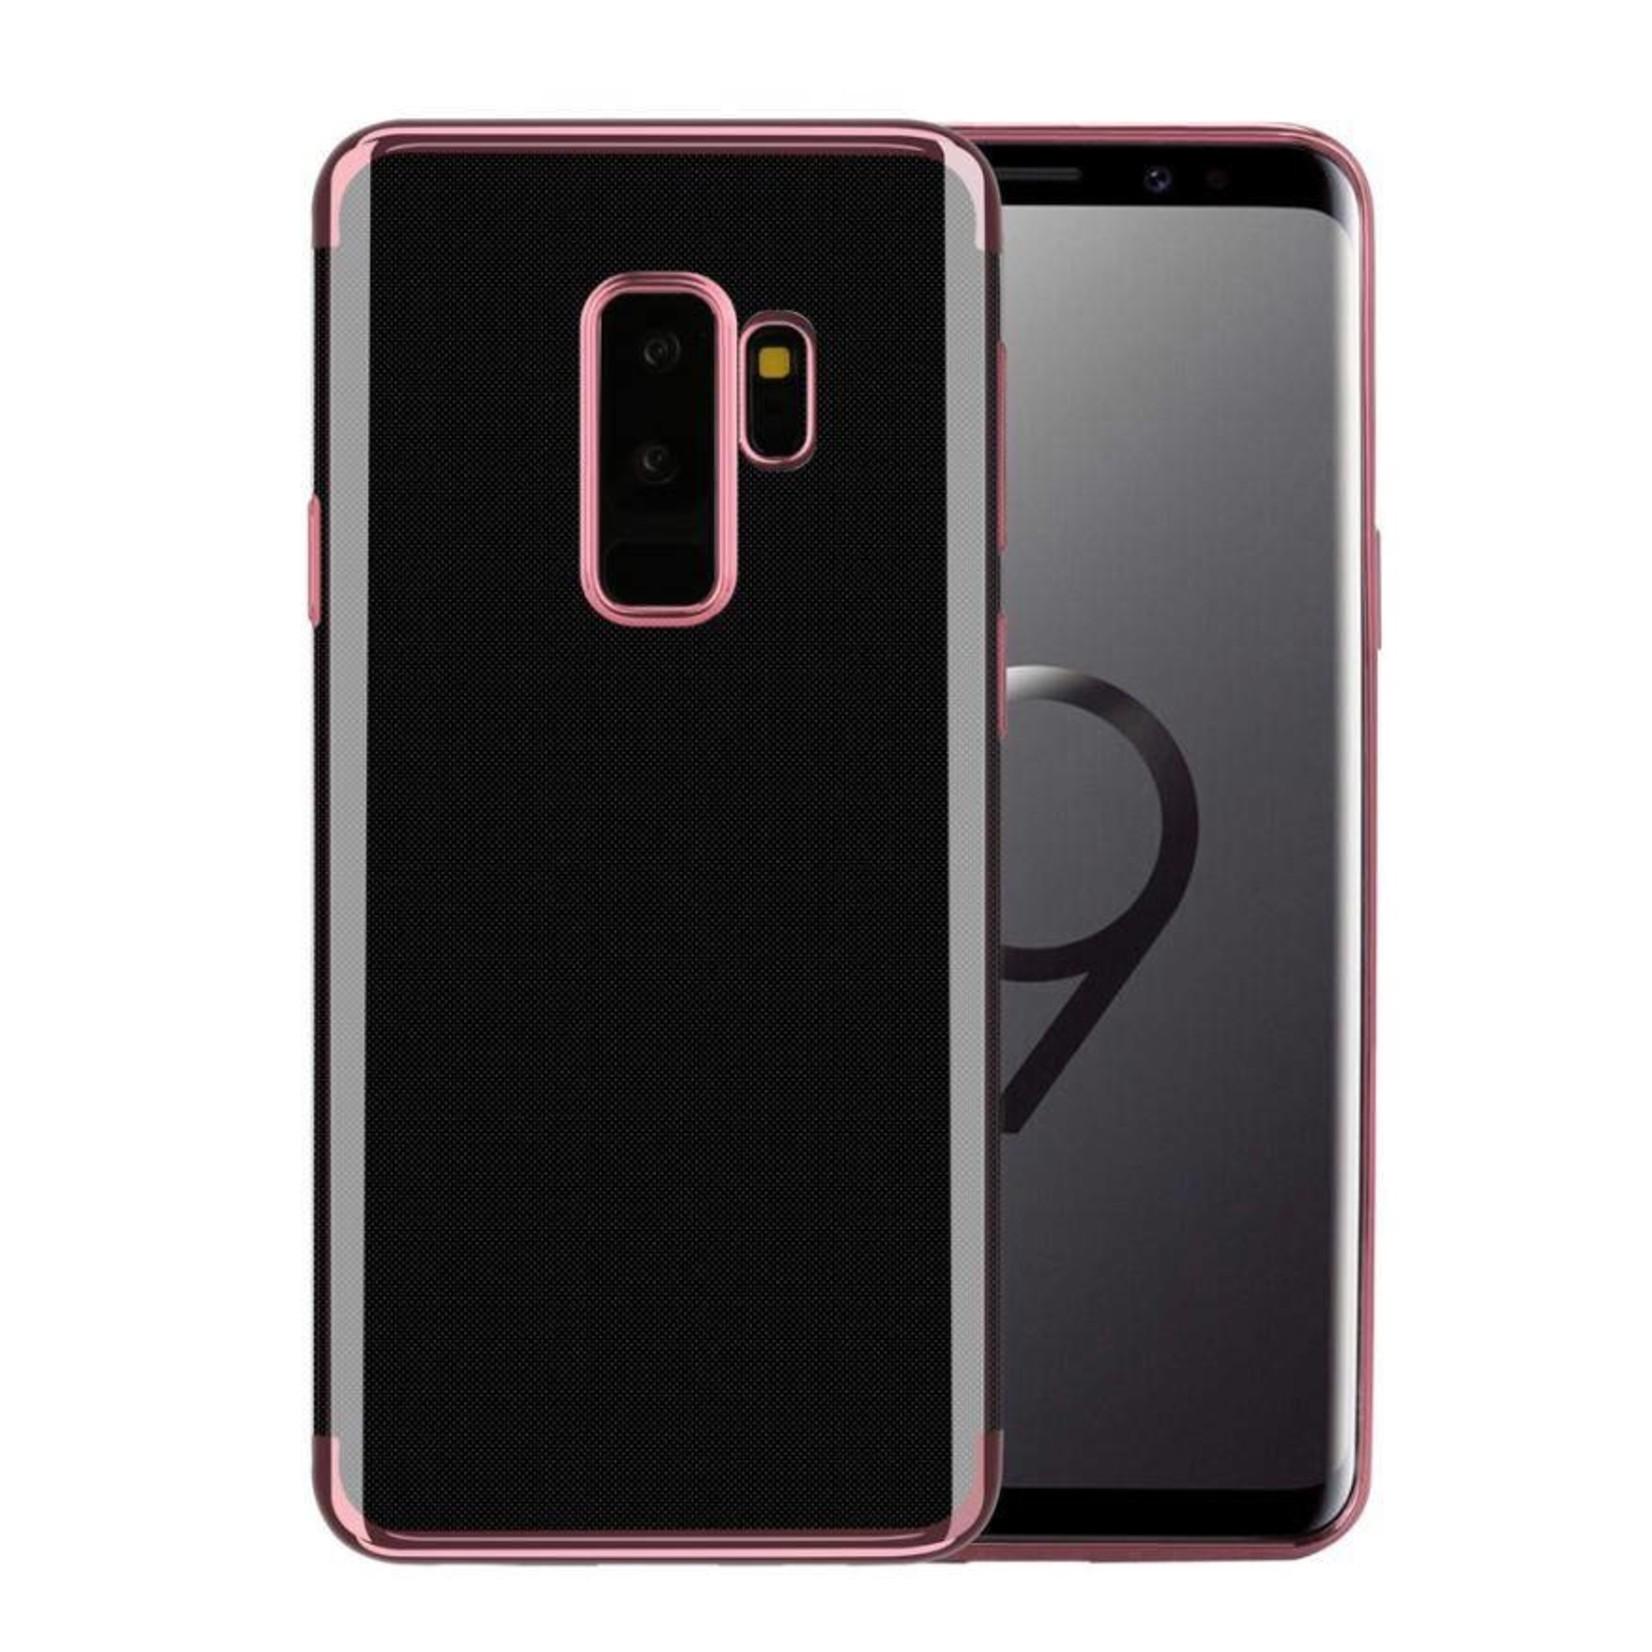 Colorfone Hoesje CoolSkin Bumper Clear voor Samsung S9 Rosé Goud